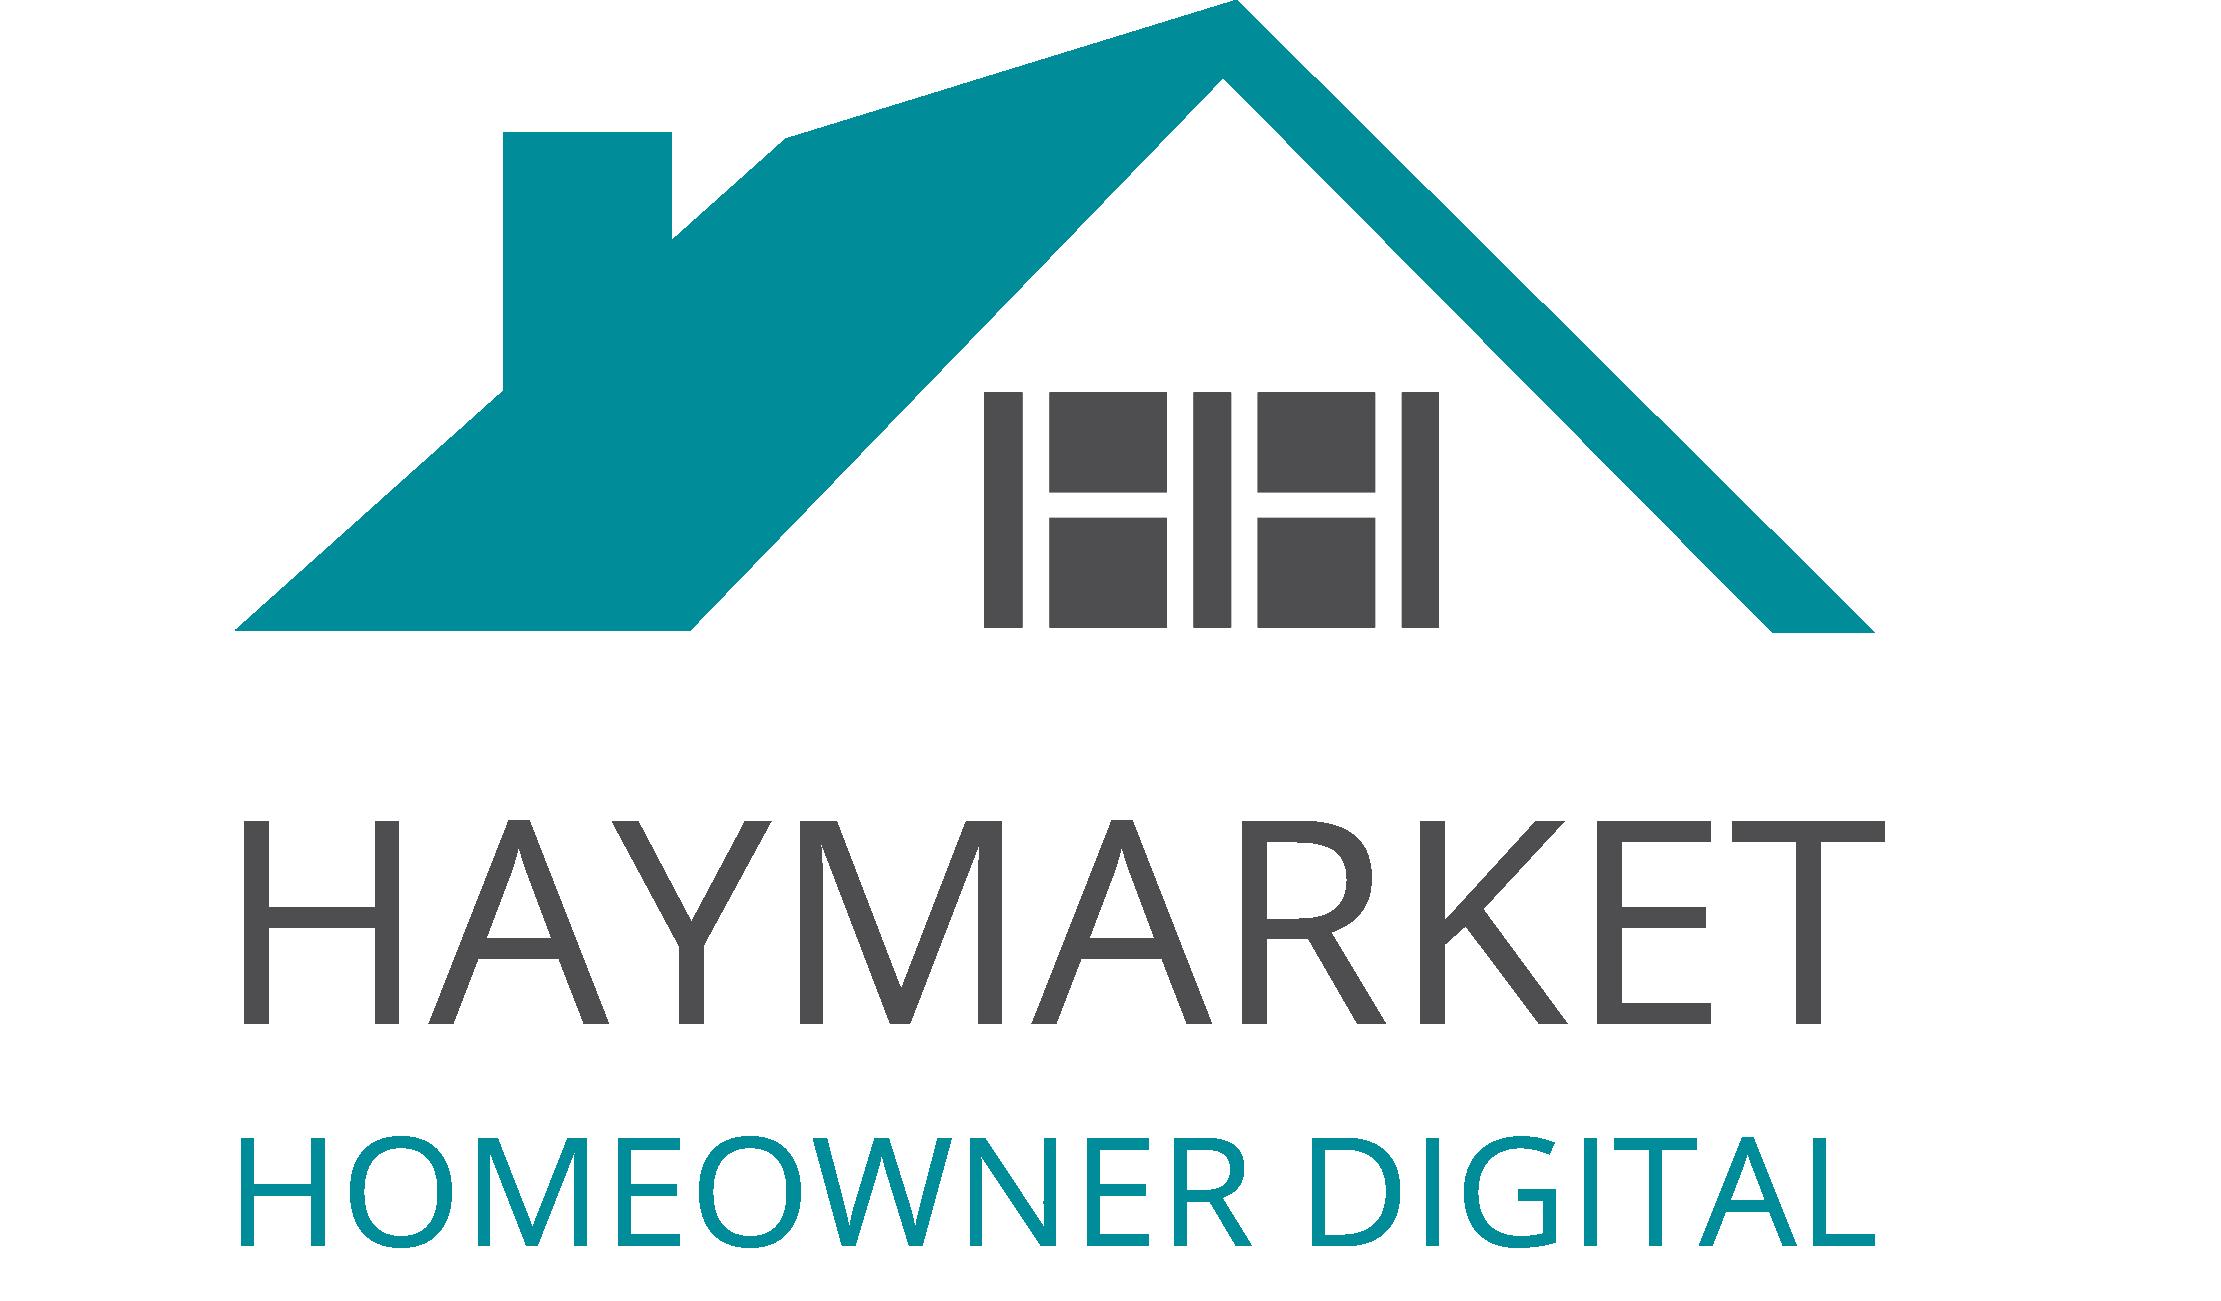 The NEW Haymarket Homeowner Digital